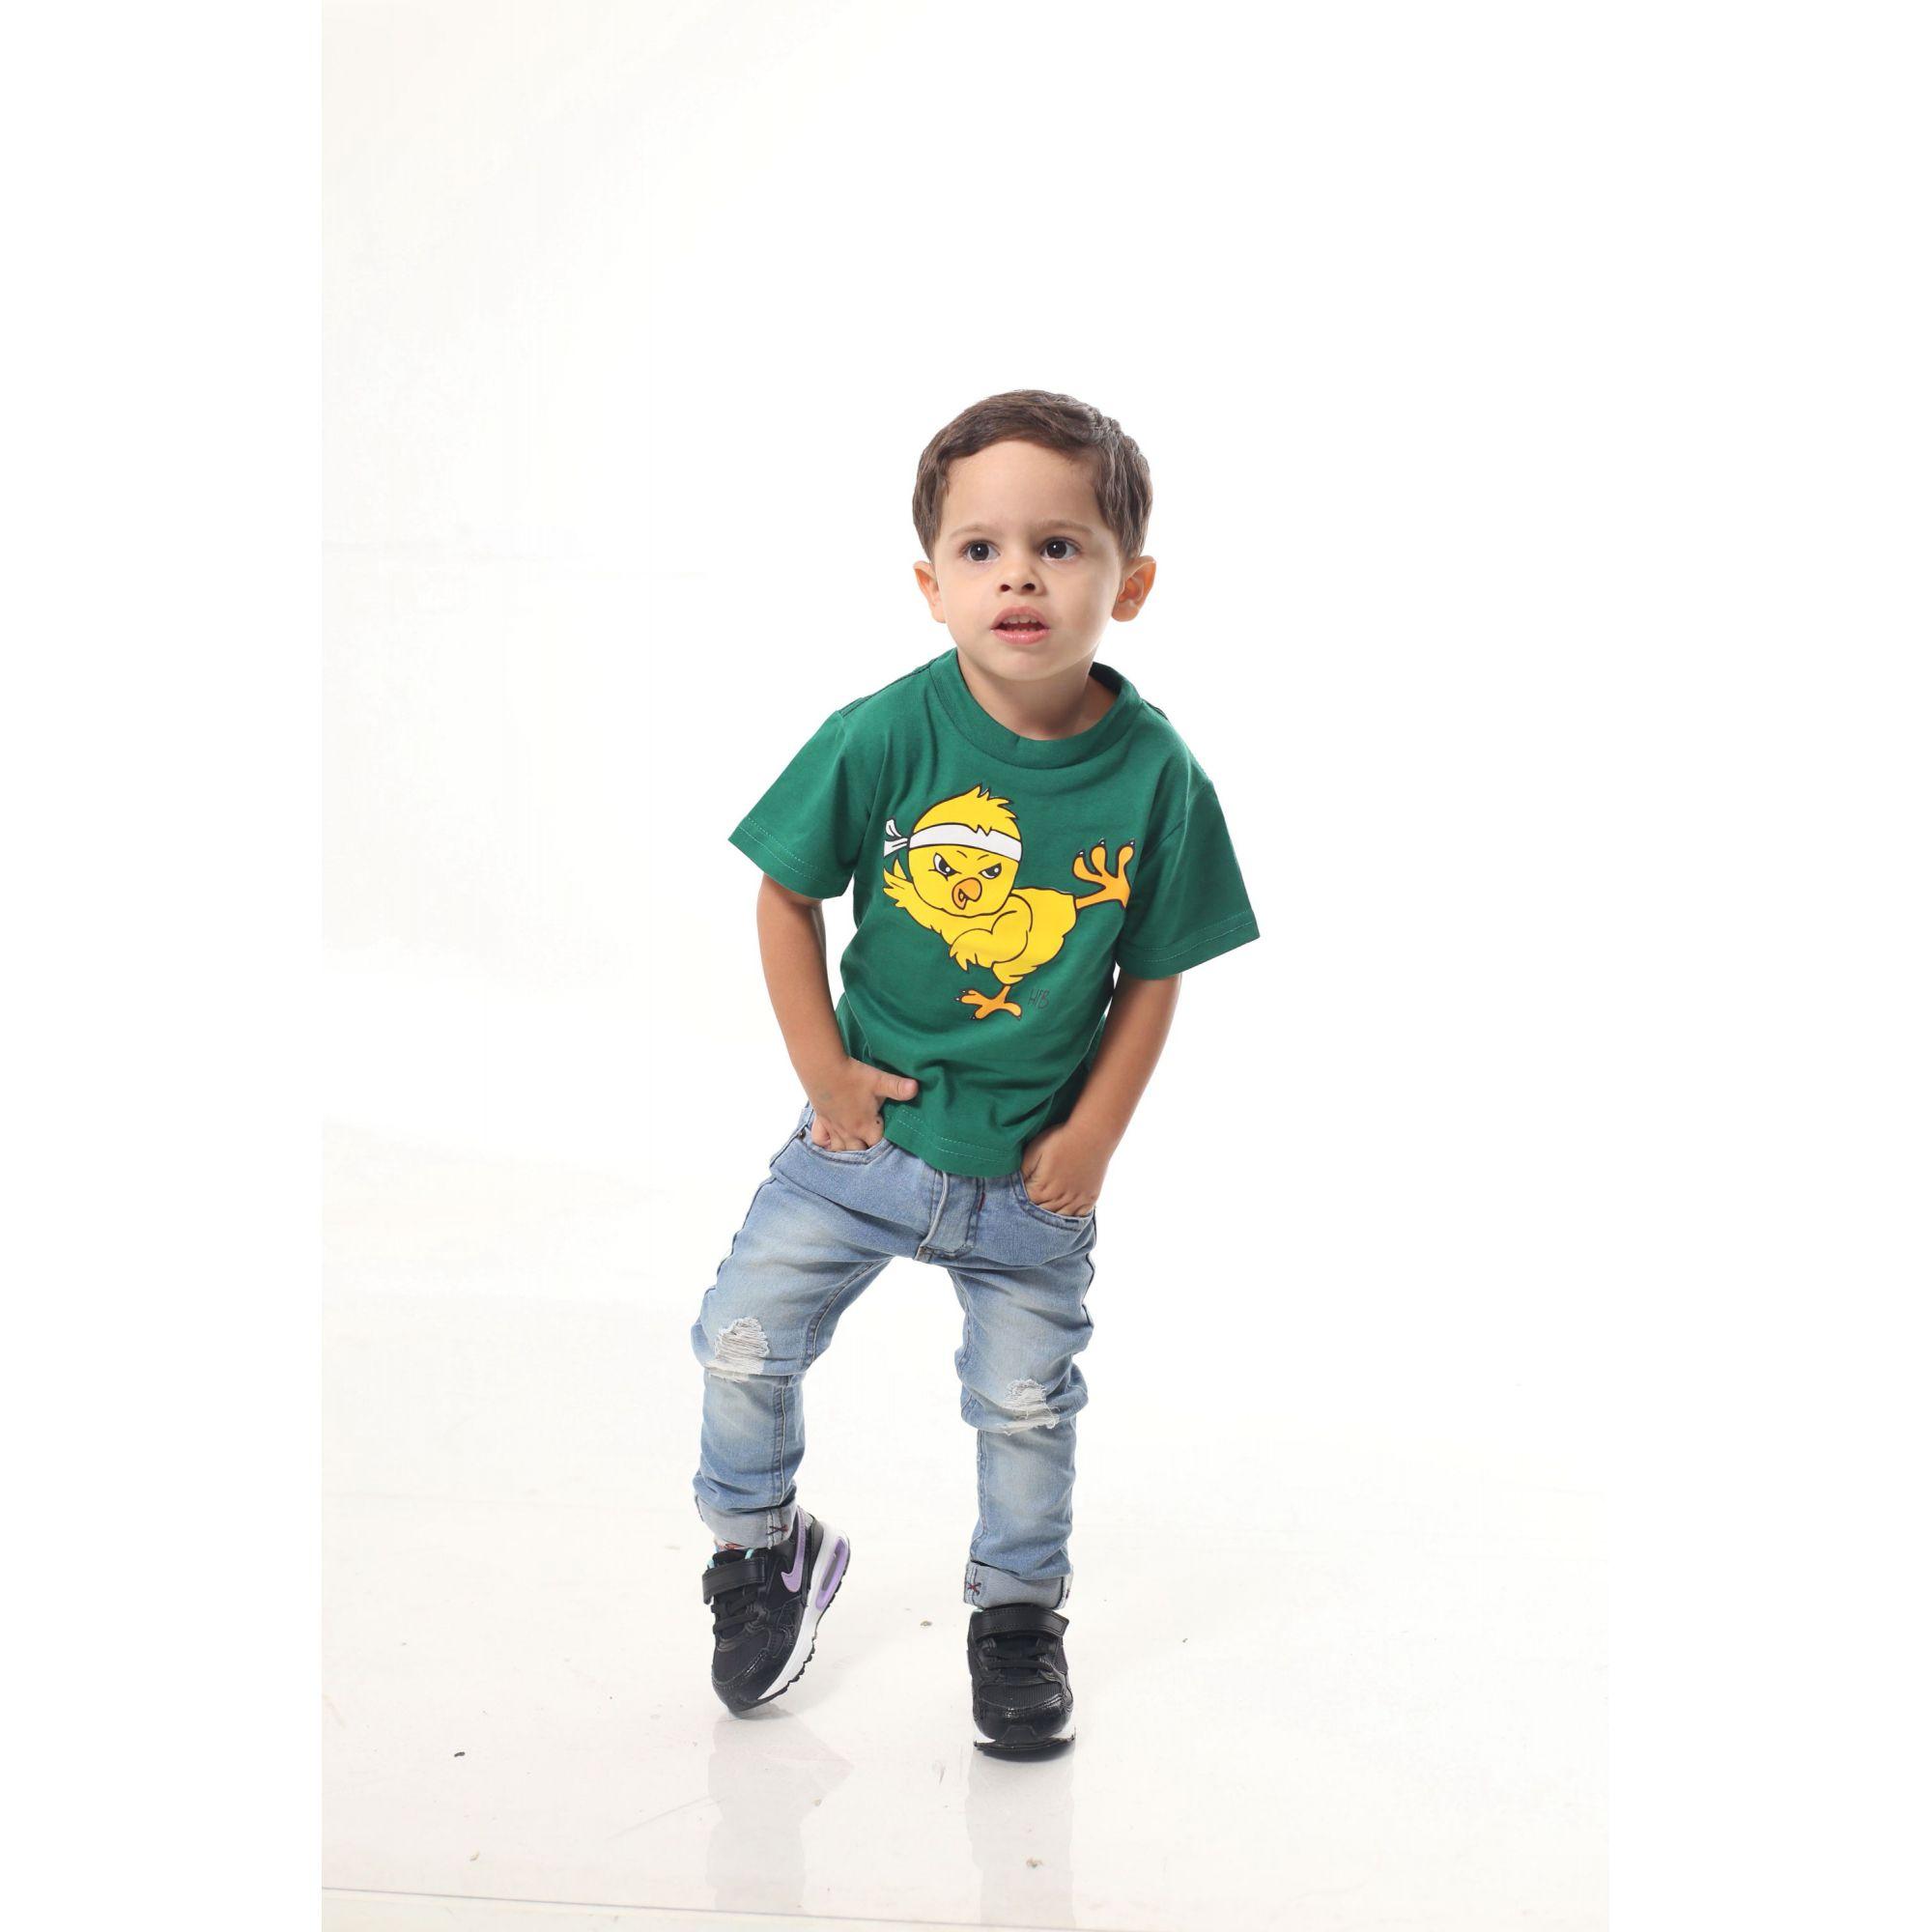 Camiseta Infantil Verde Pintinho  - Heitor Fashion Brazil